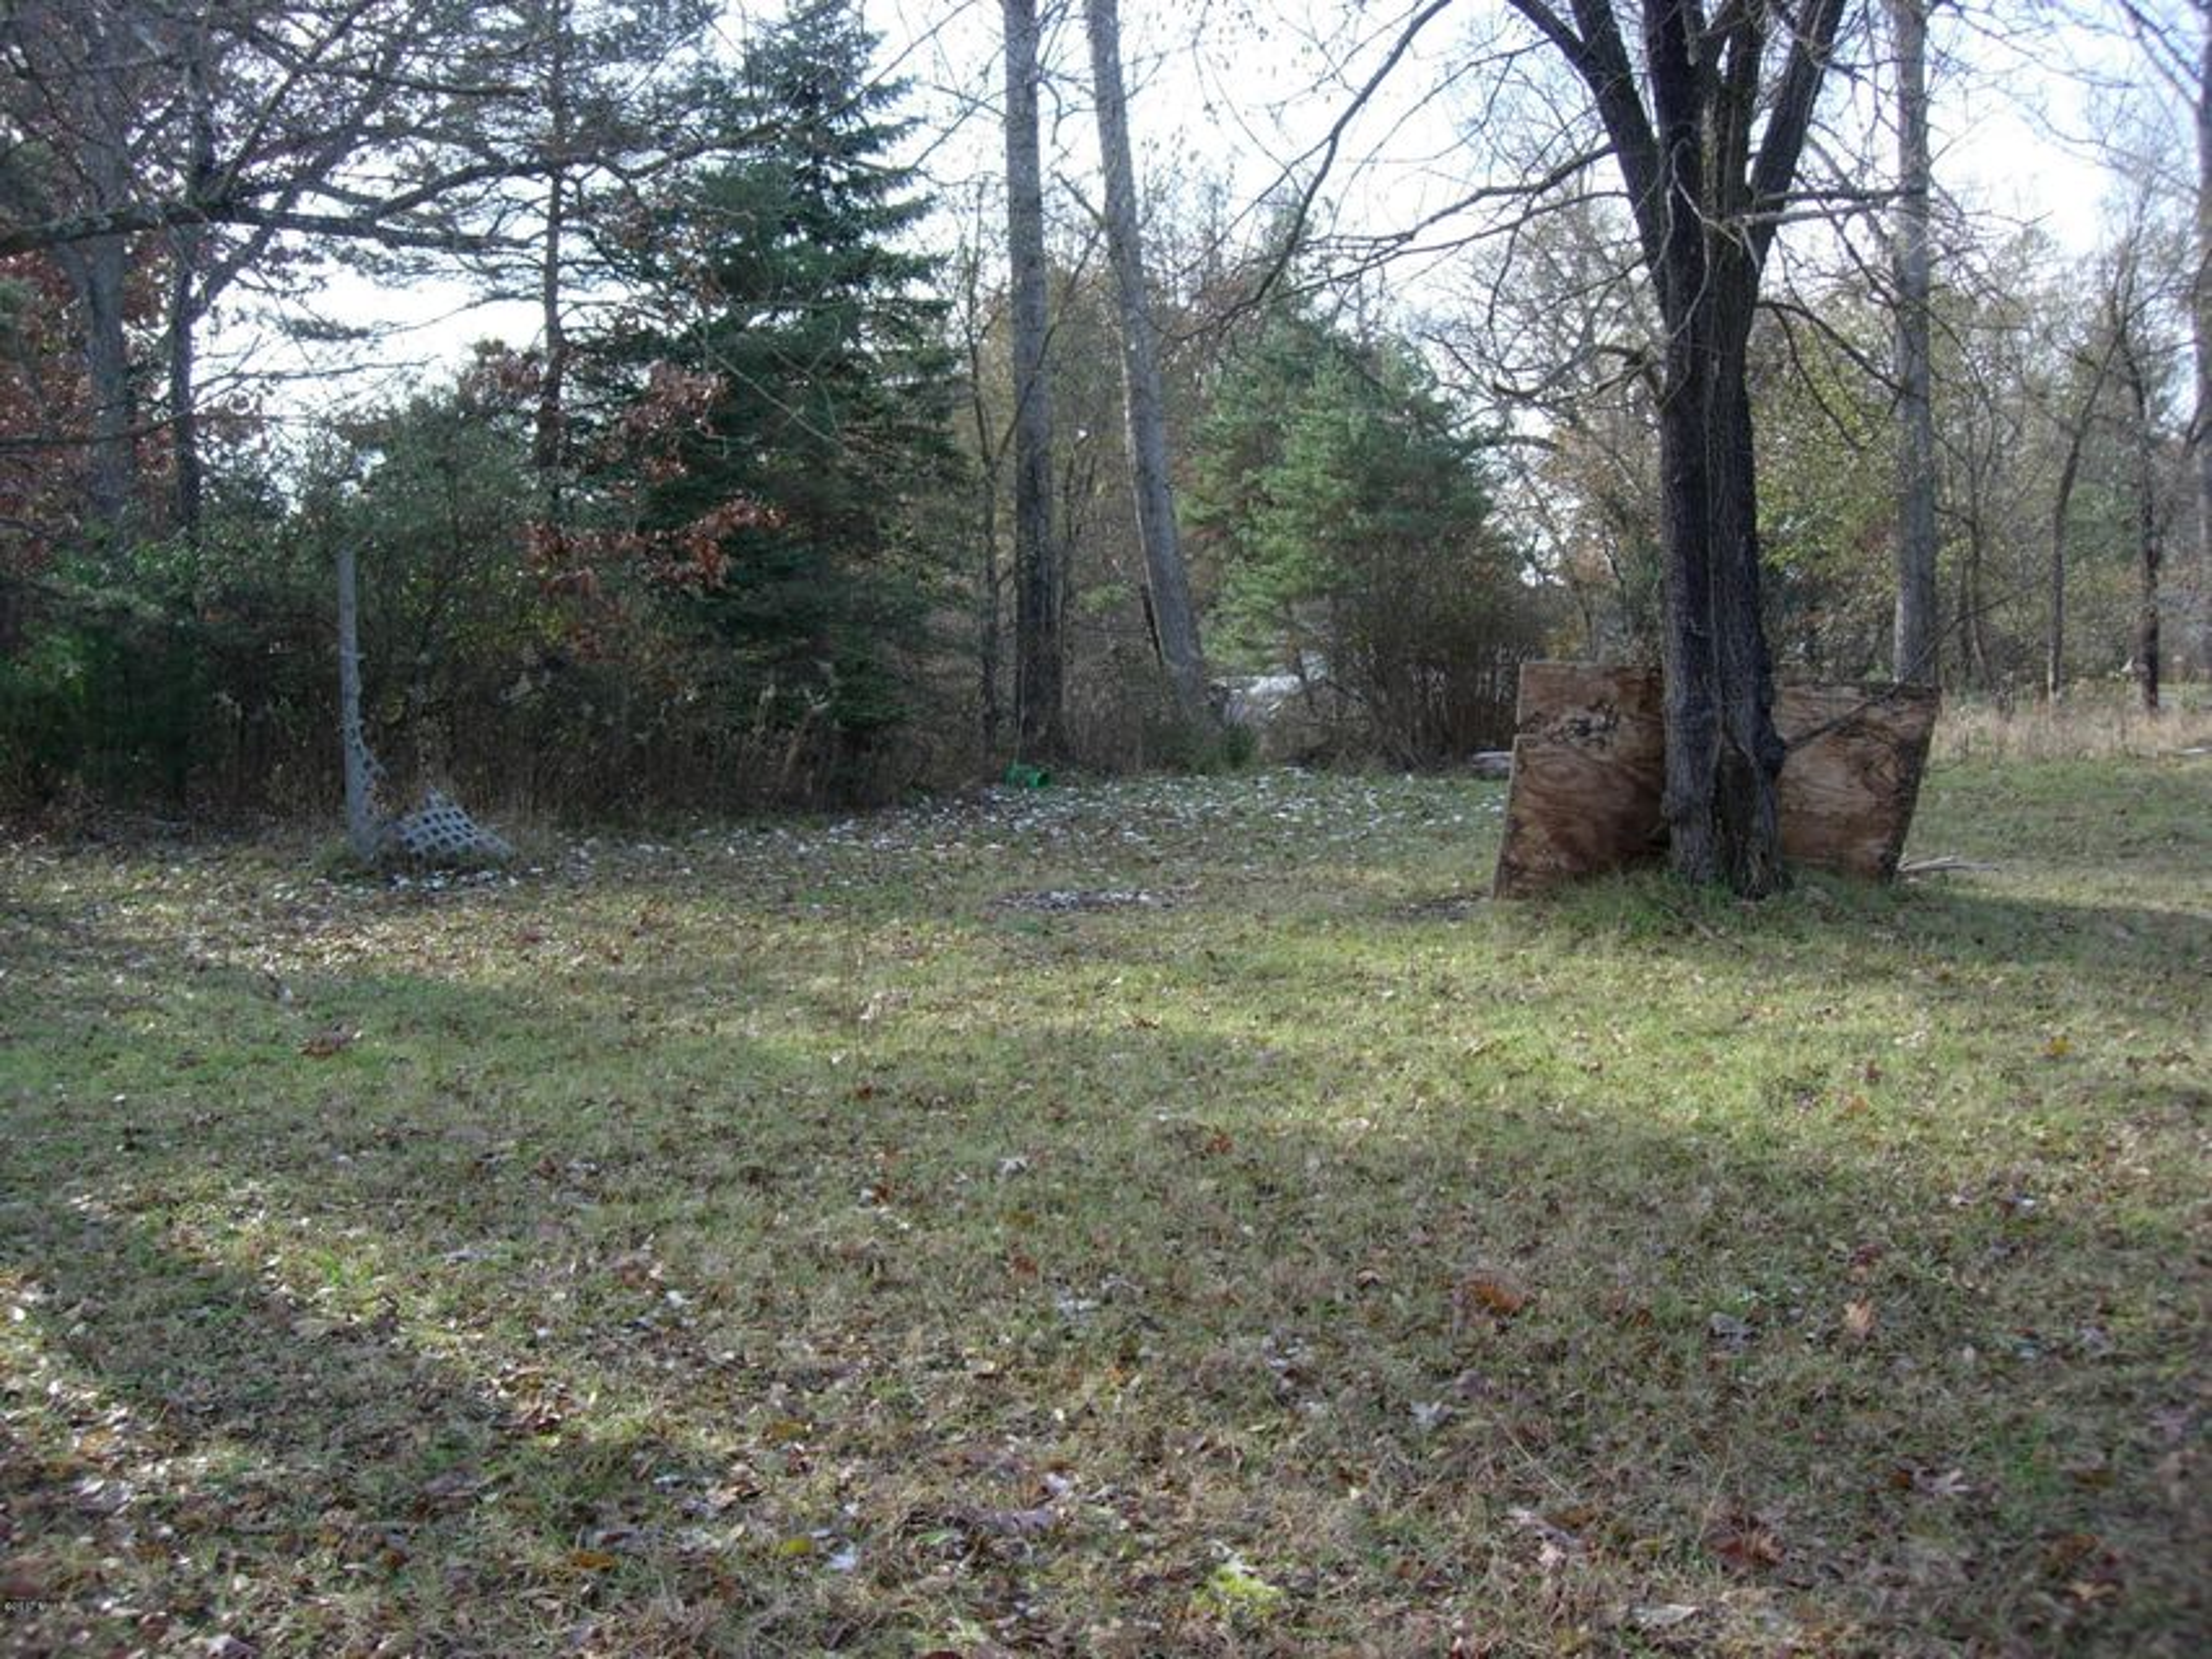 Land for Sale at 14163 Coates 14163 Coates Brethren, Michigan 49619 United States